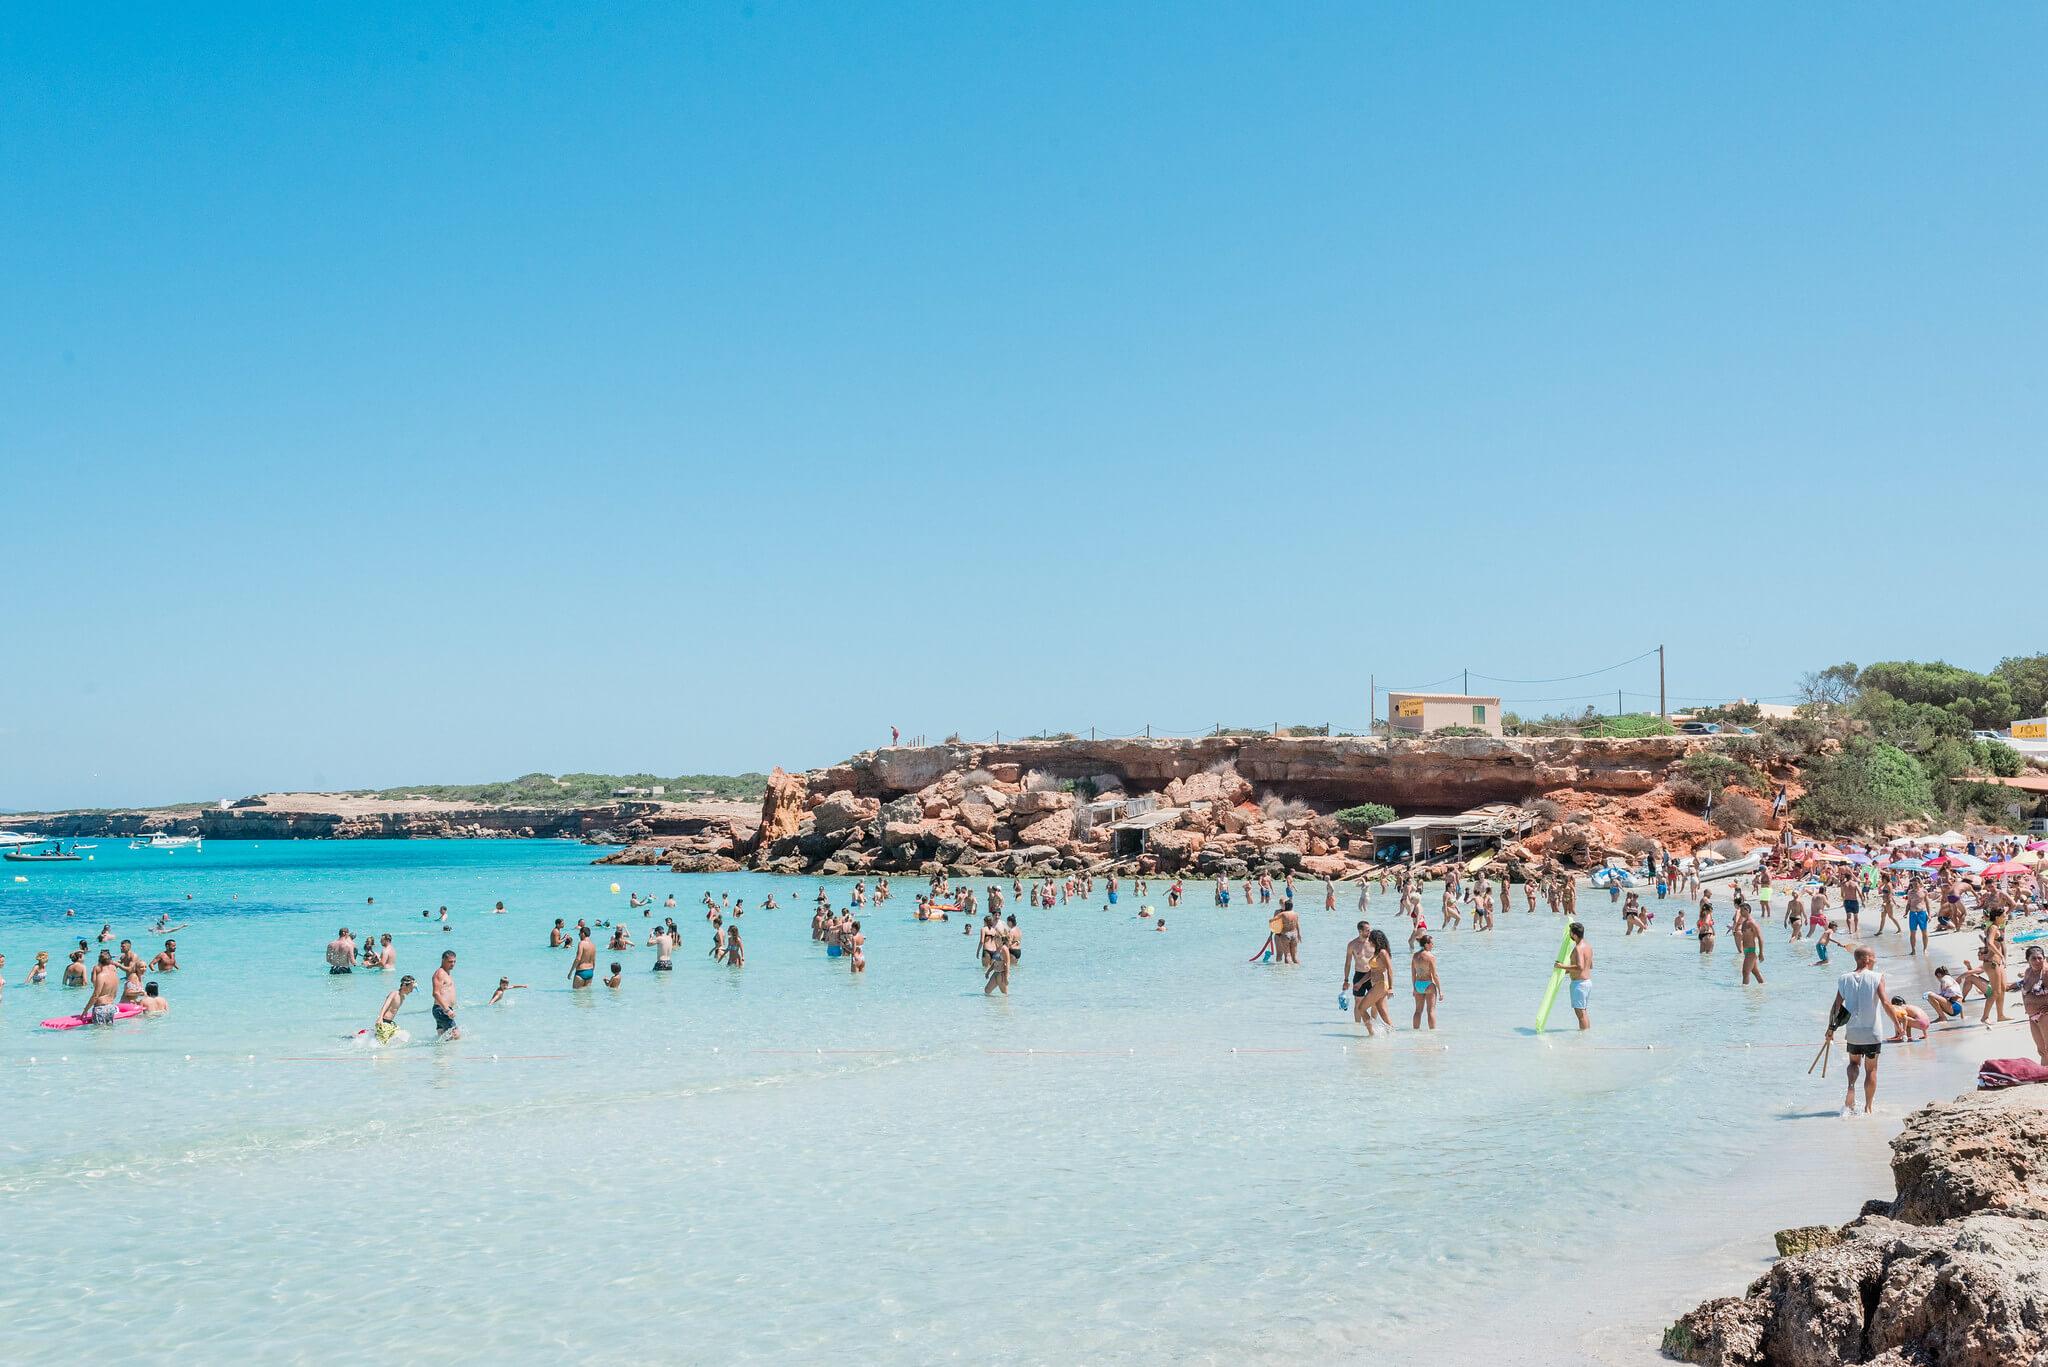 https://www.white-ibiza.com/wp-content/uploads/2020/03/formentera-beaches-cala-saona-2020-06.jpg